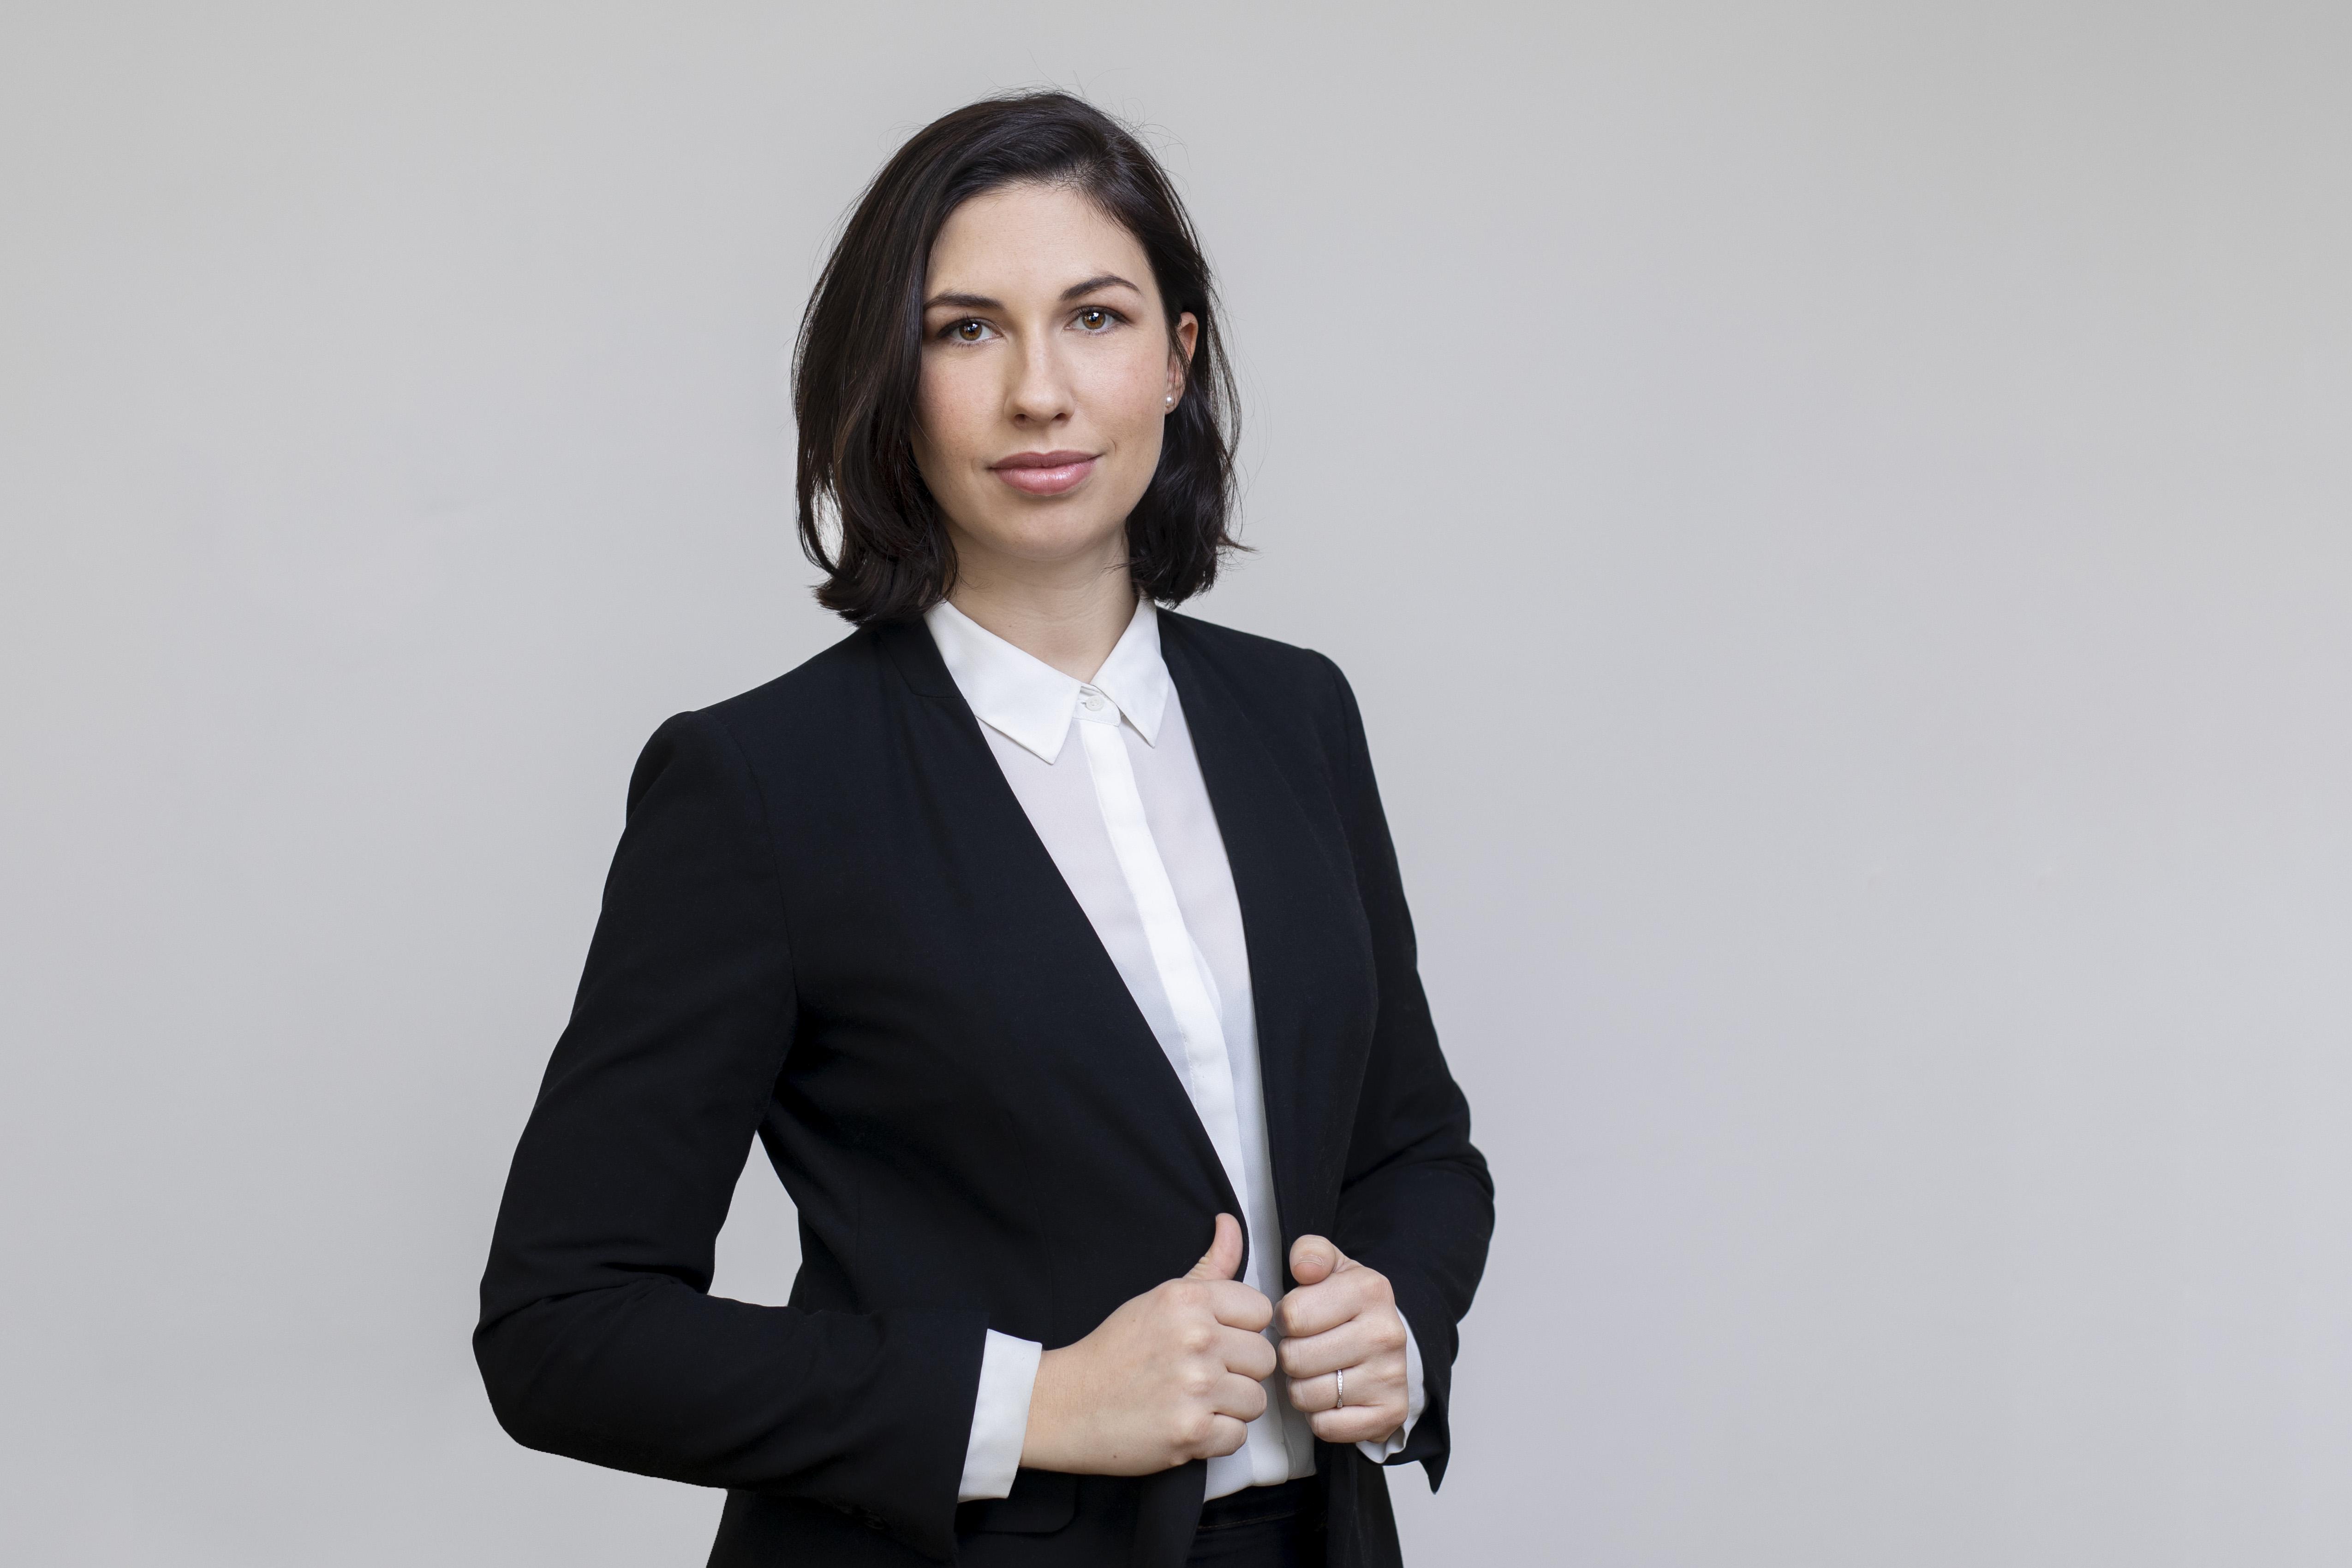 Nikola Gruber-Hellmeier